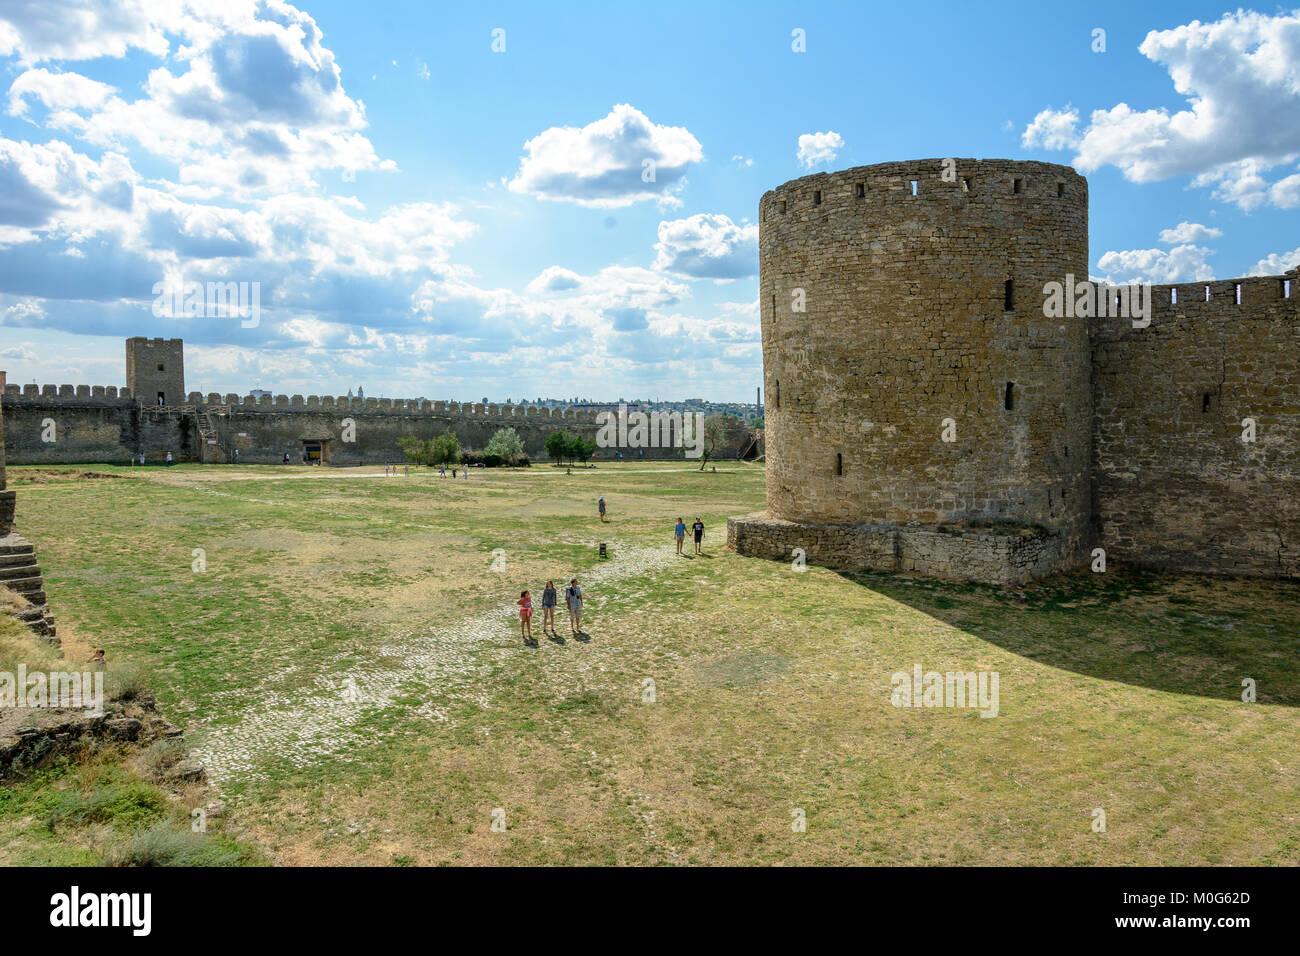 Akkerman Fortress: description, history 100